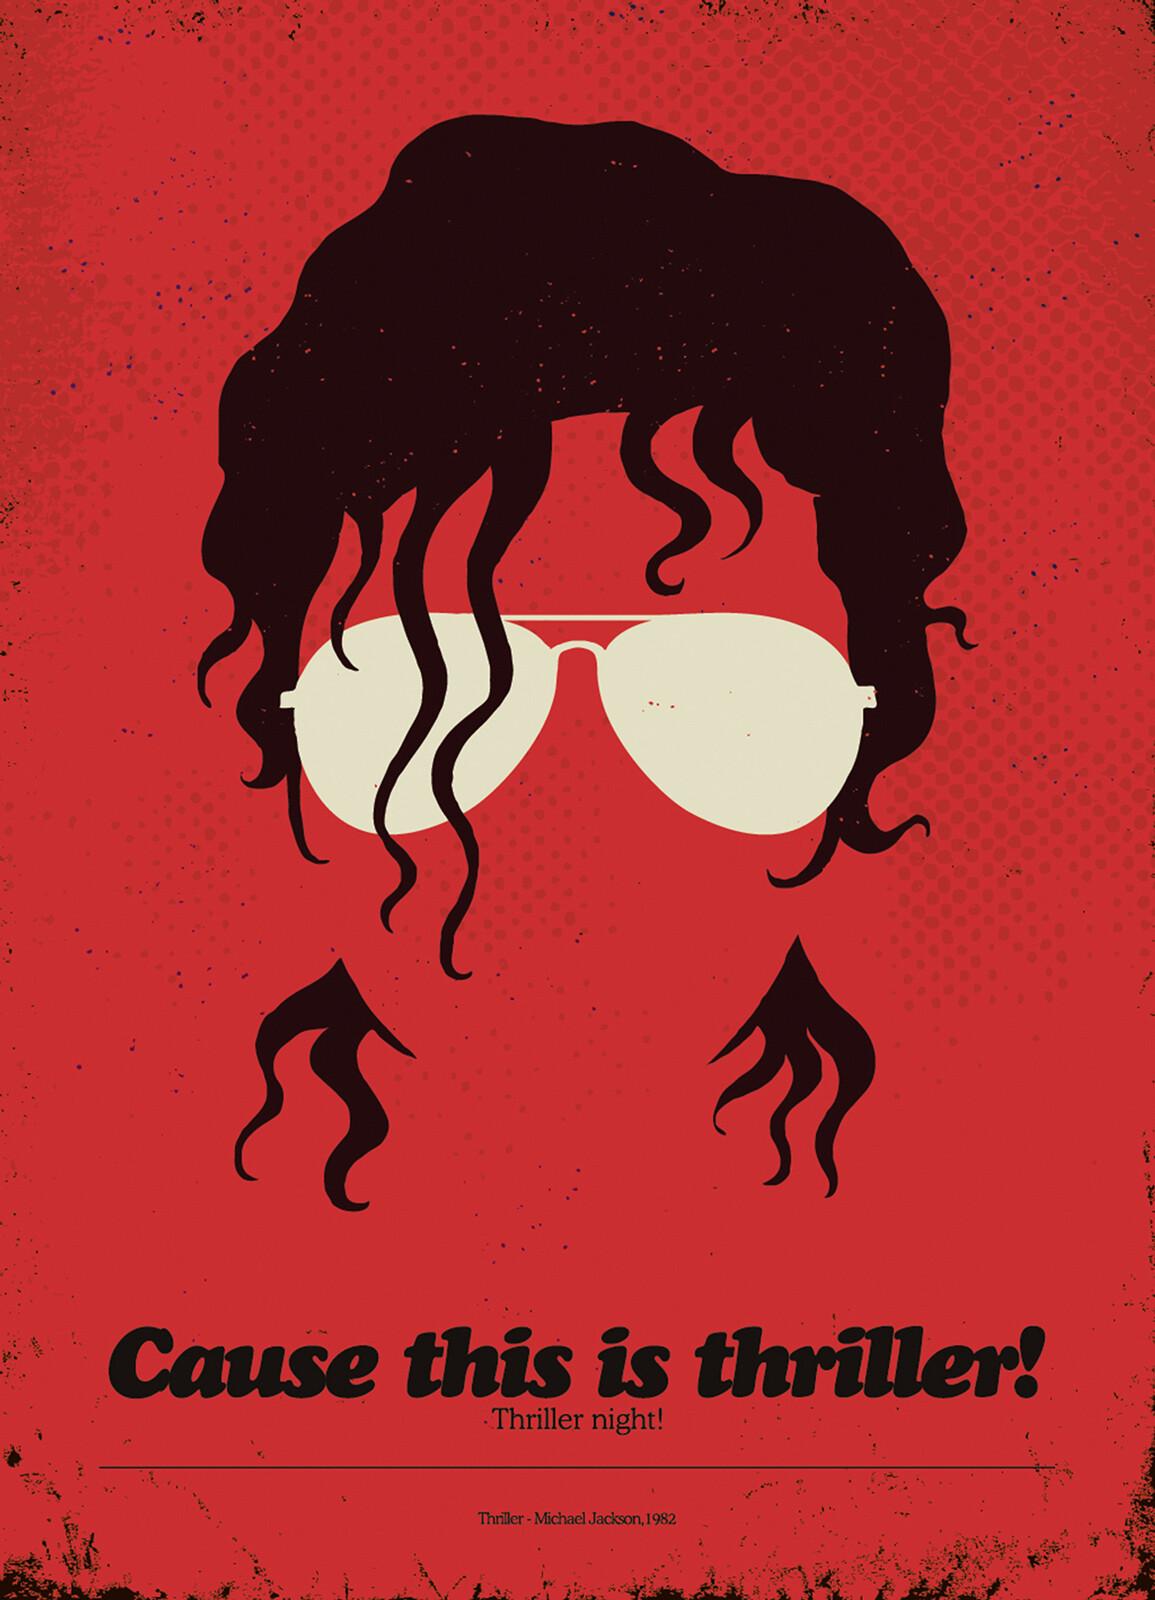 Cause this is thriller - Rafael Barletta